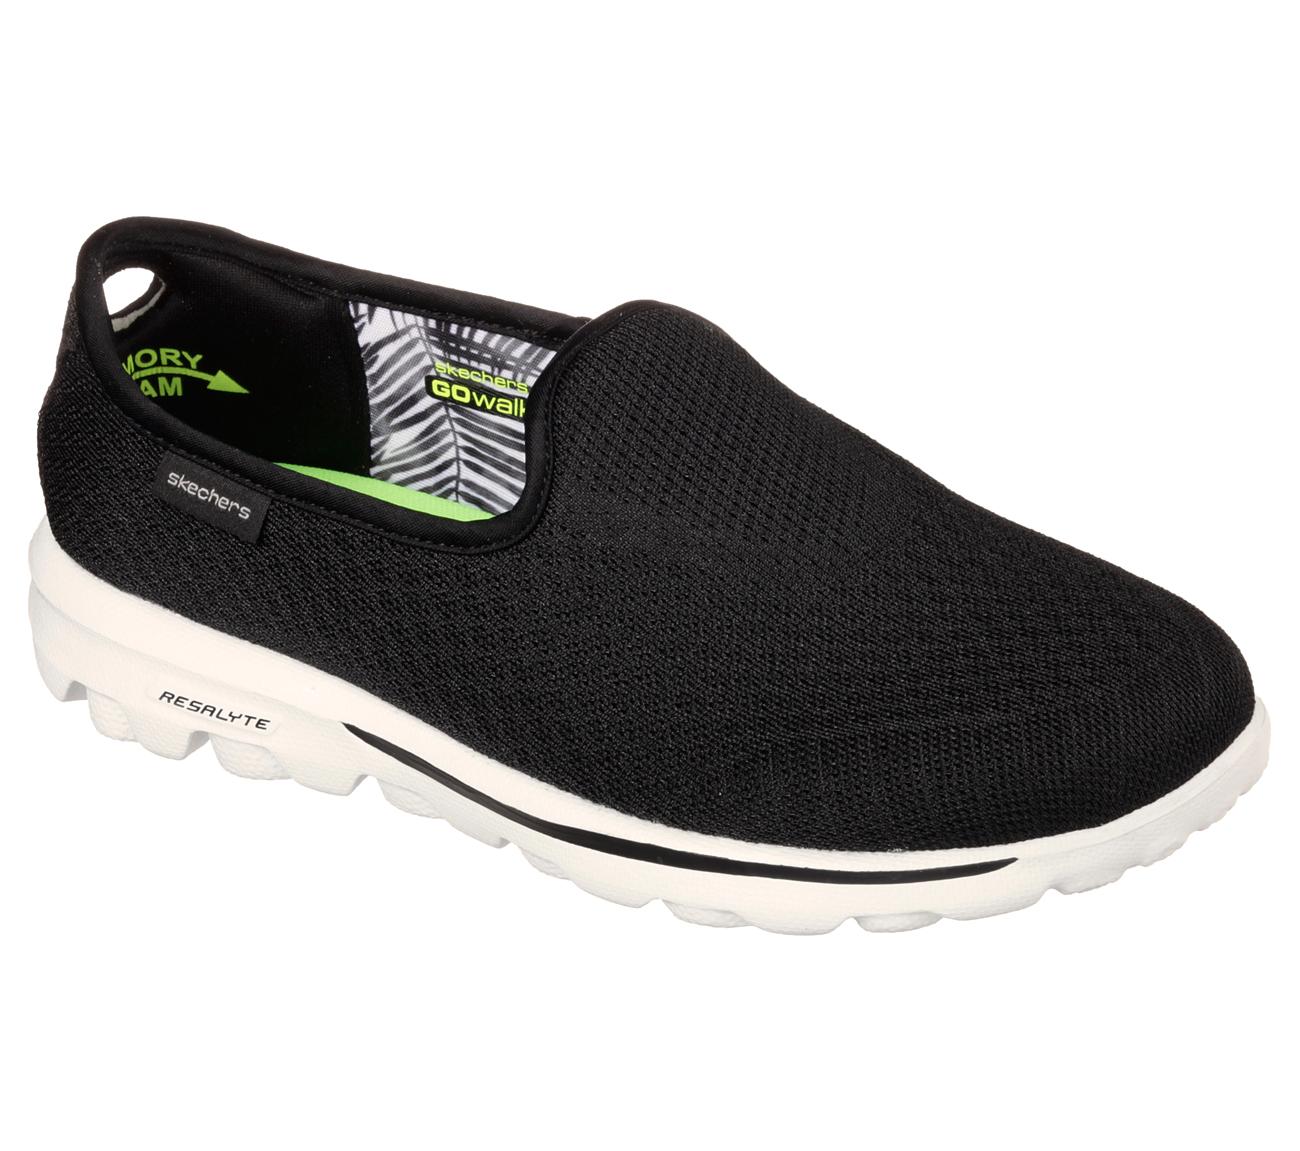 Skechers Women's EZ Flex 2 - Sweatpea Memory Foam Slip-On Sneakers from Finish Line - Finish Line Athletic Shoes - Shoes - Macy's